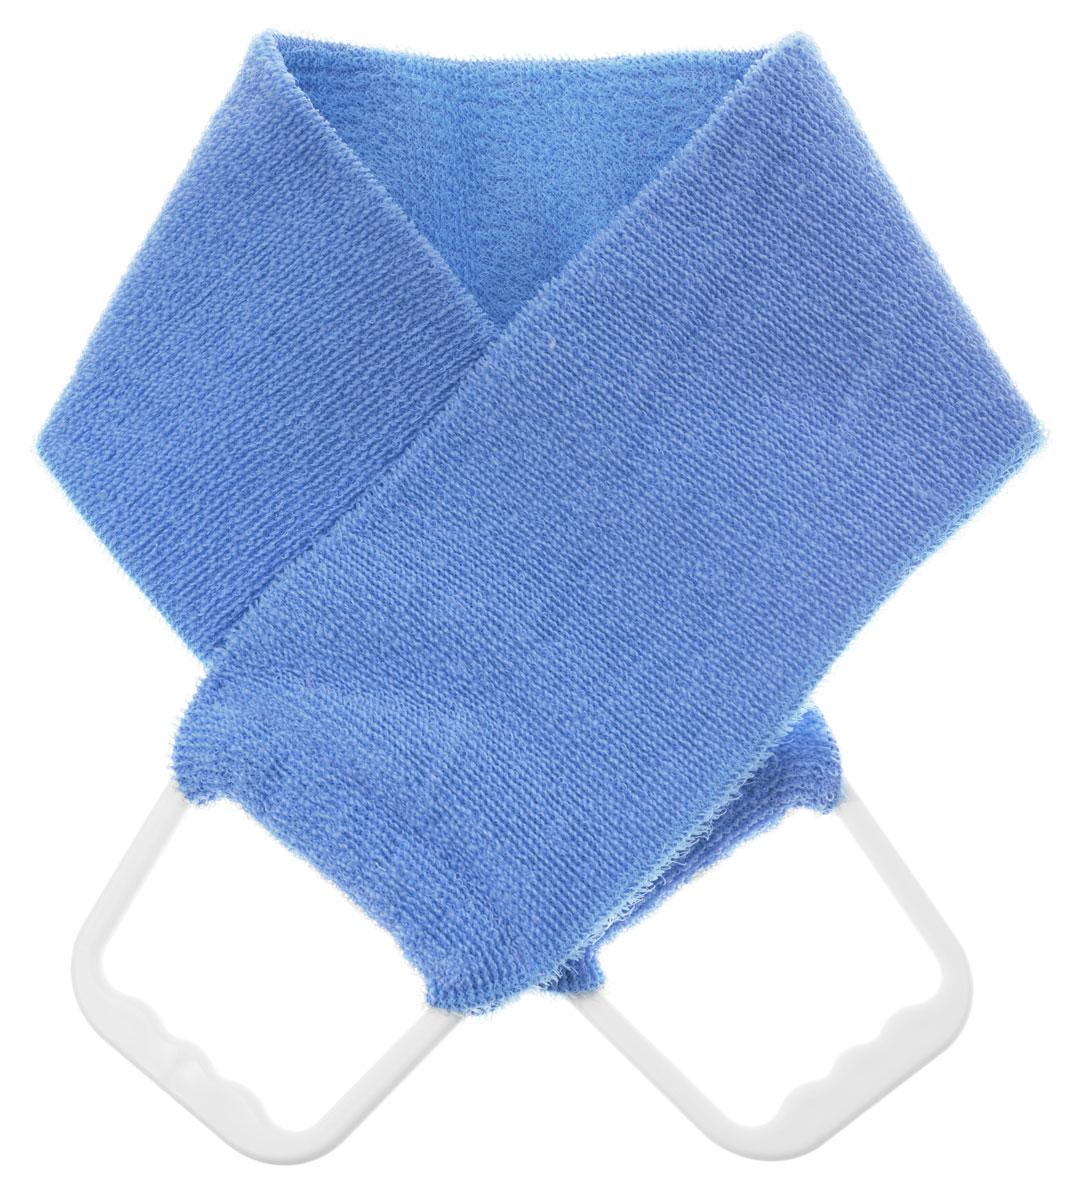 Riffi Мочалка-пояс, двухсторонняя, цвет: голубой. 727727_голубой